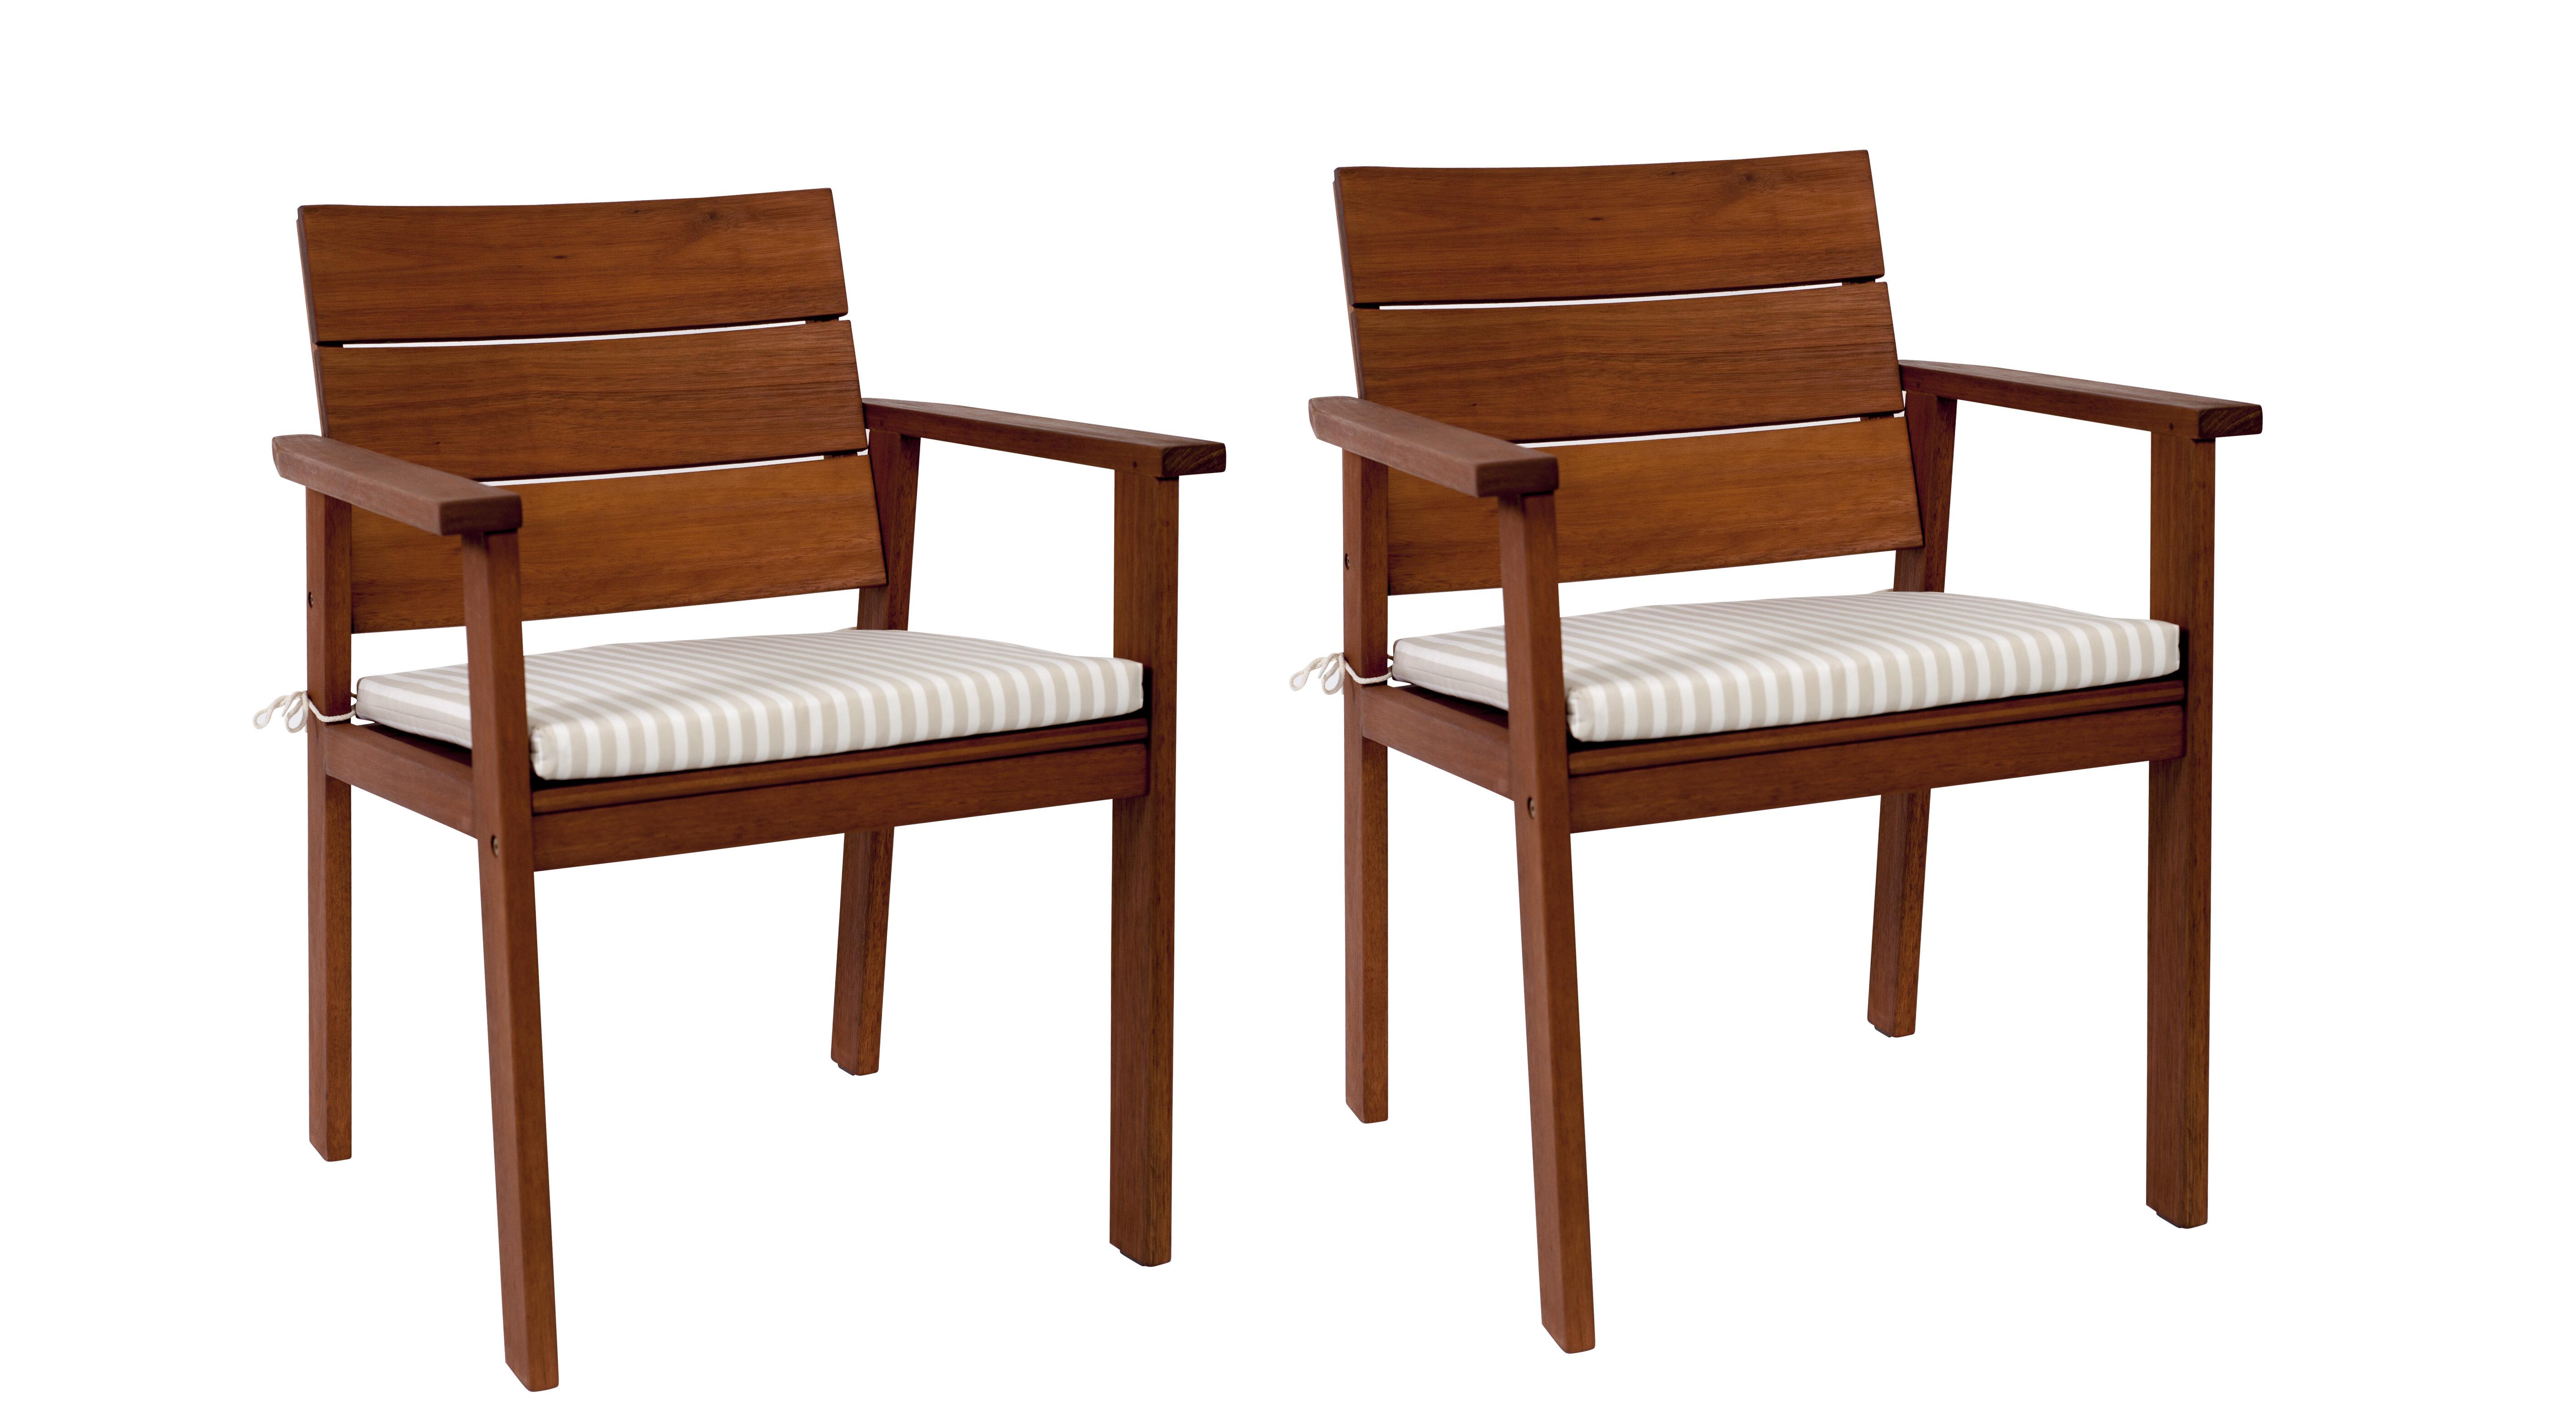 Brighton Patio Furniture.Brighton Patio Dining Chair With Cushion